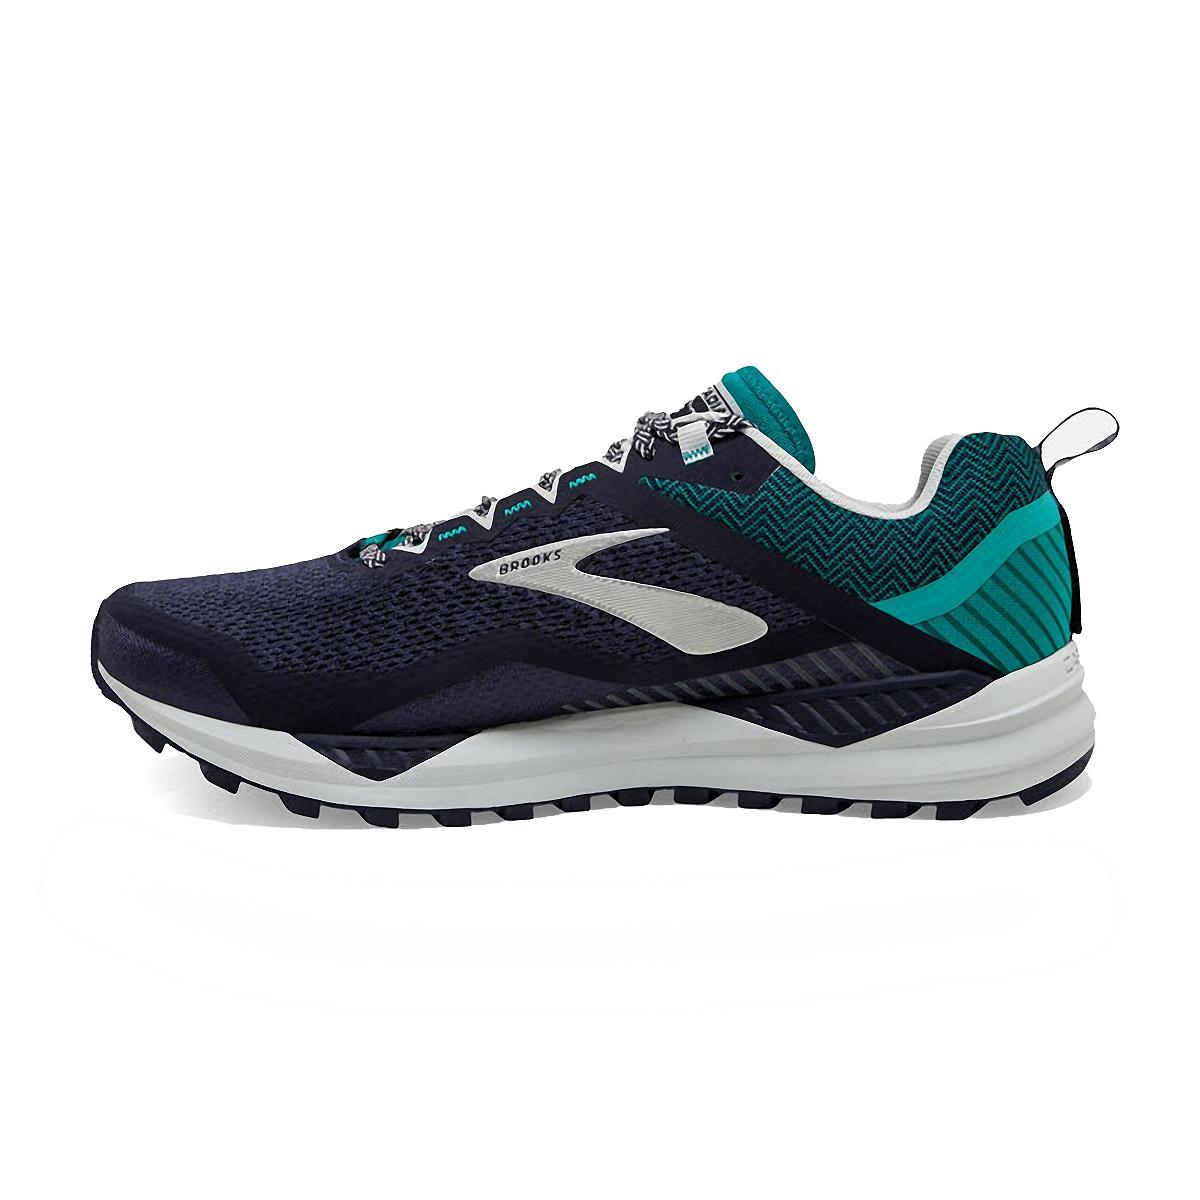 Men's Brooks Cascadia 14 Trail Running Shoe - Color: Navy/Blue Grass - Size: 7 - Width: Regular, Navy/Blue Grass, large, image 2